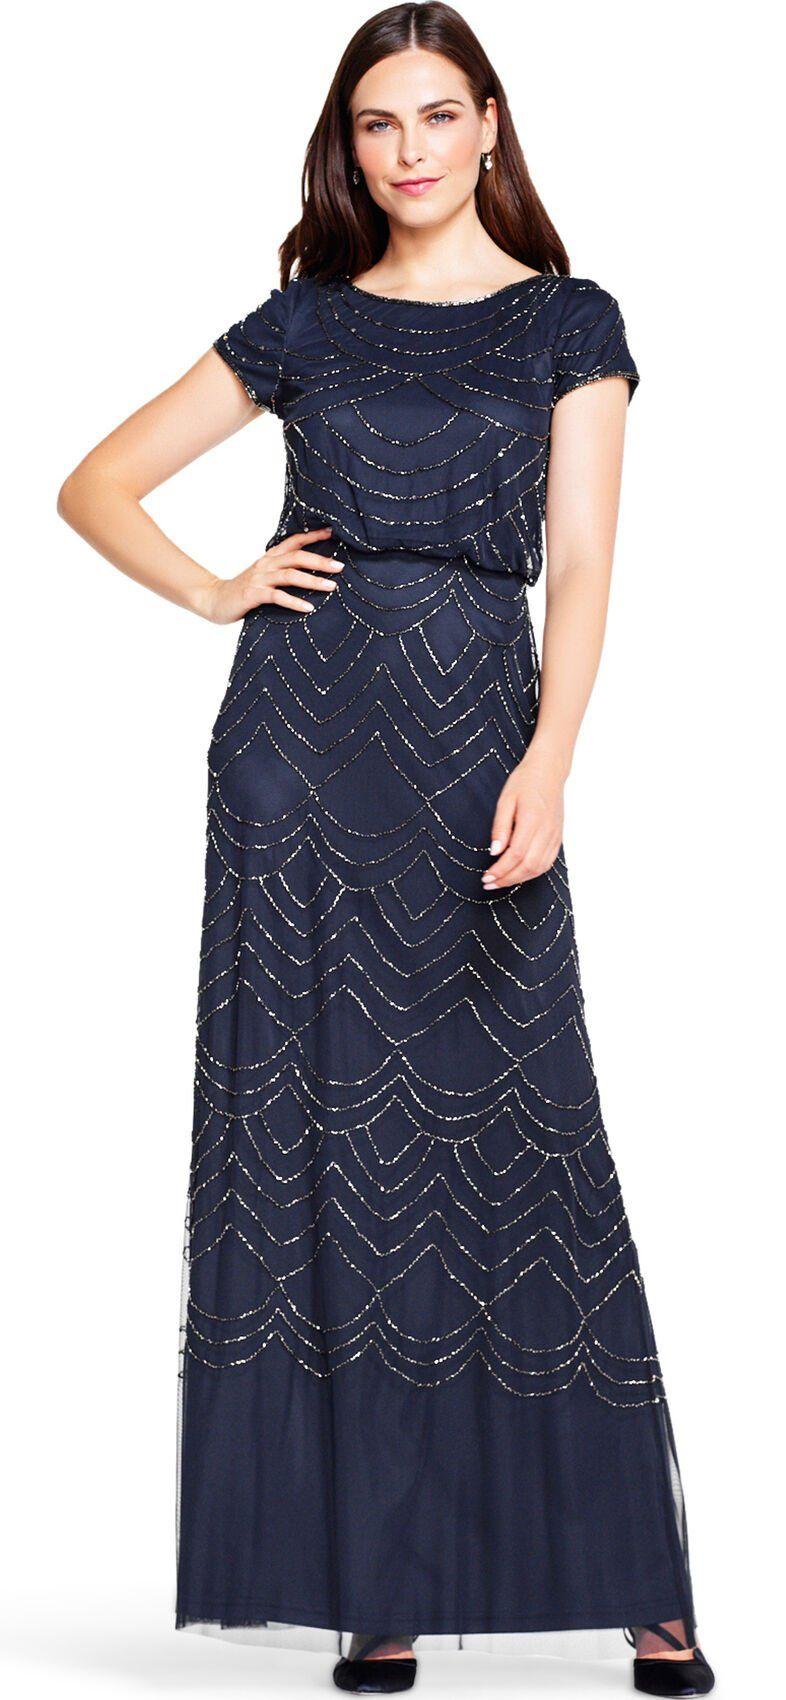 Short Sleeve Blouson Beaded Gown In Navy Evening Dresses With Sleeves Sleek Dress Beaded Gown [ 1700 x 786 Pixel ]